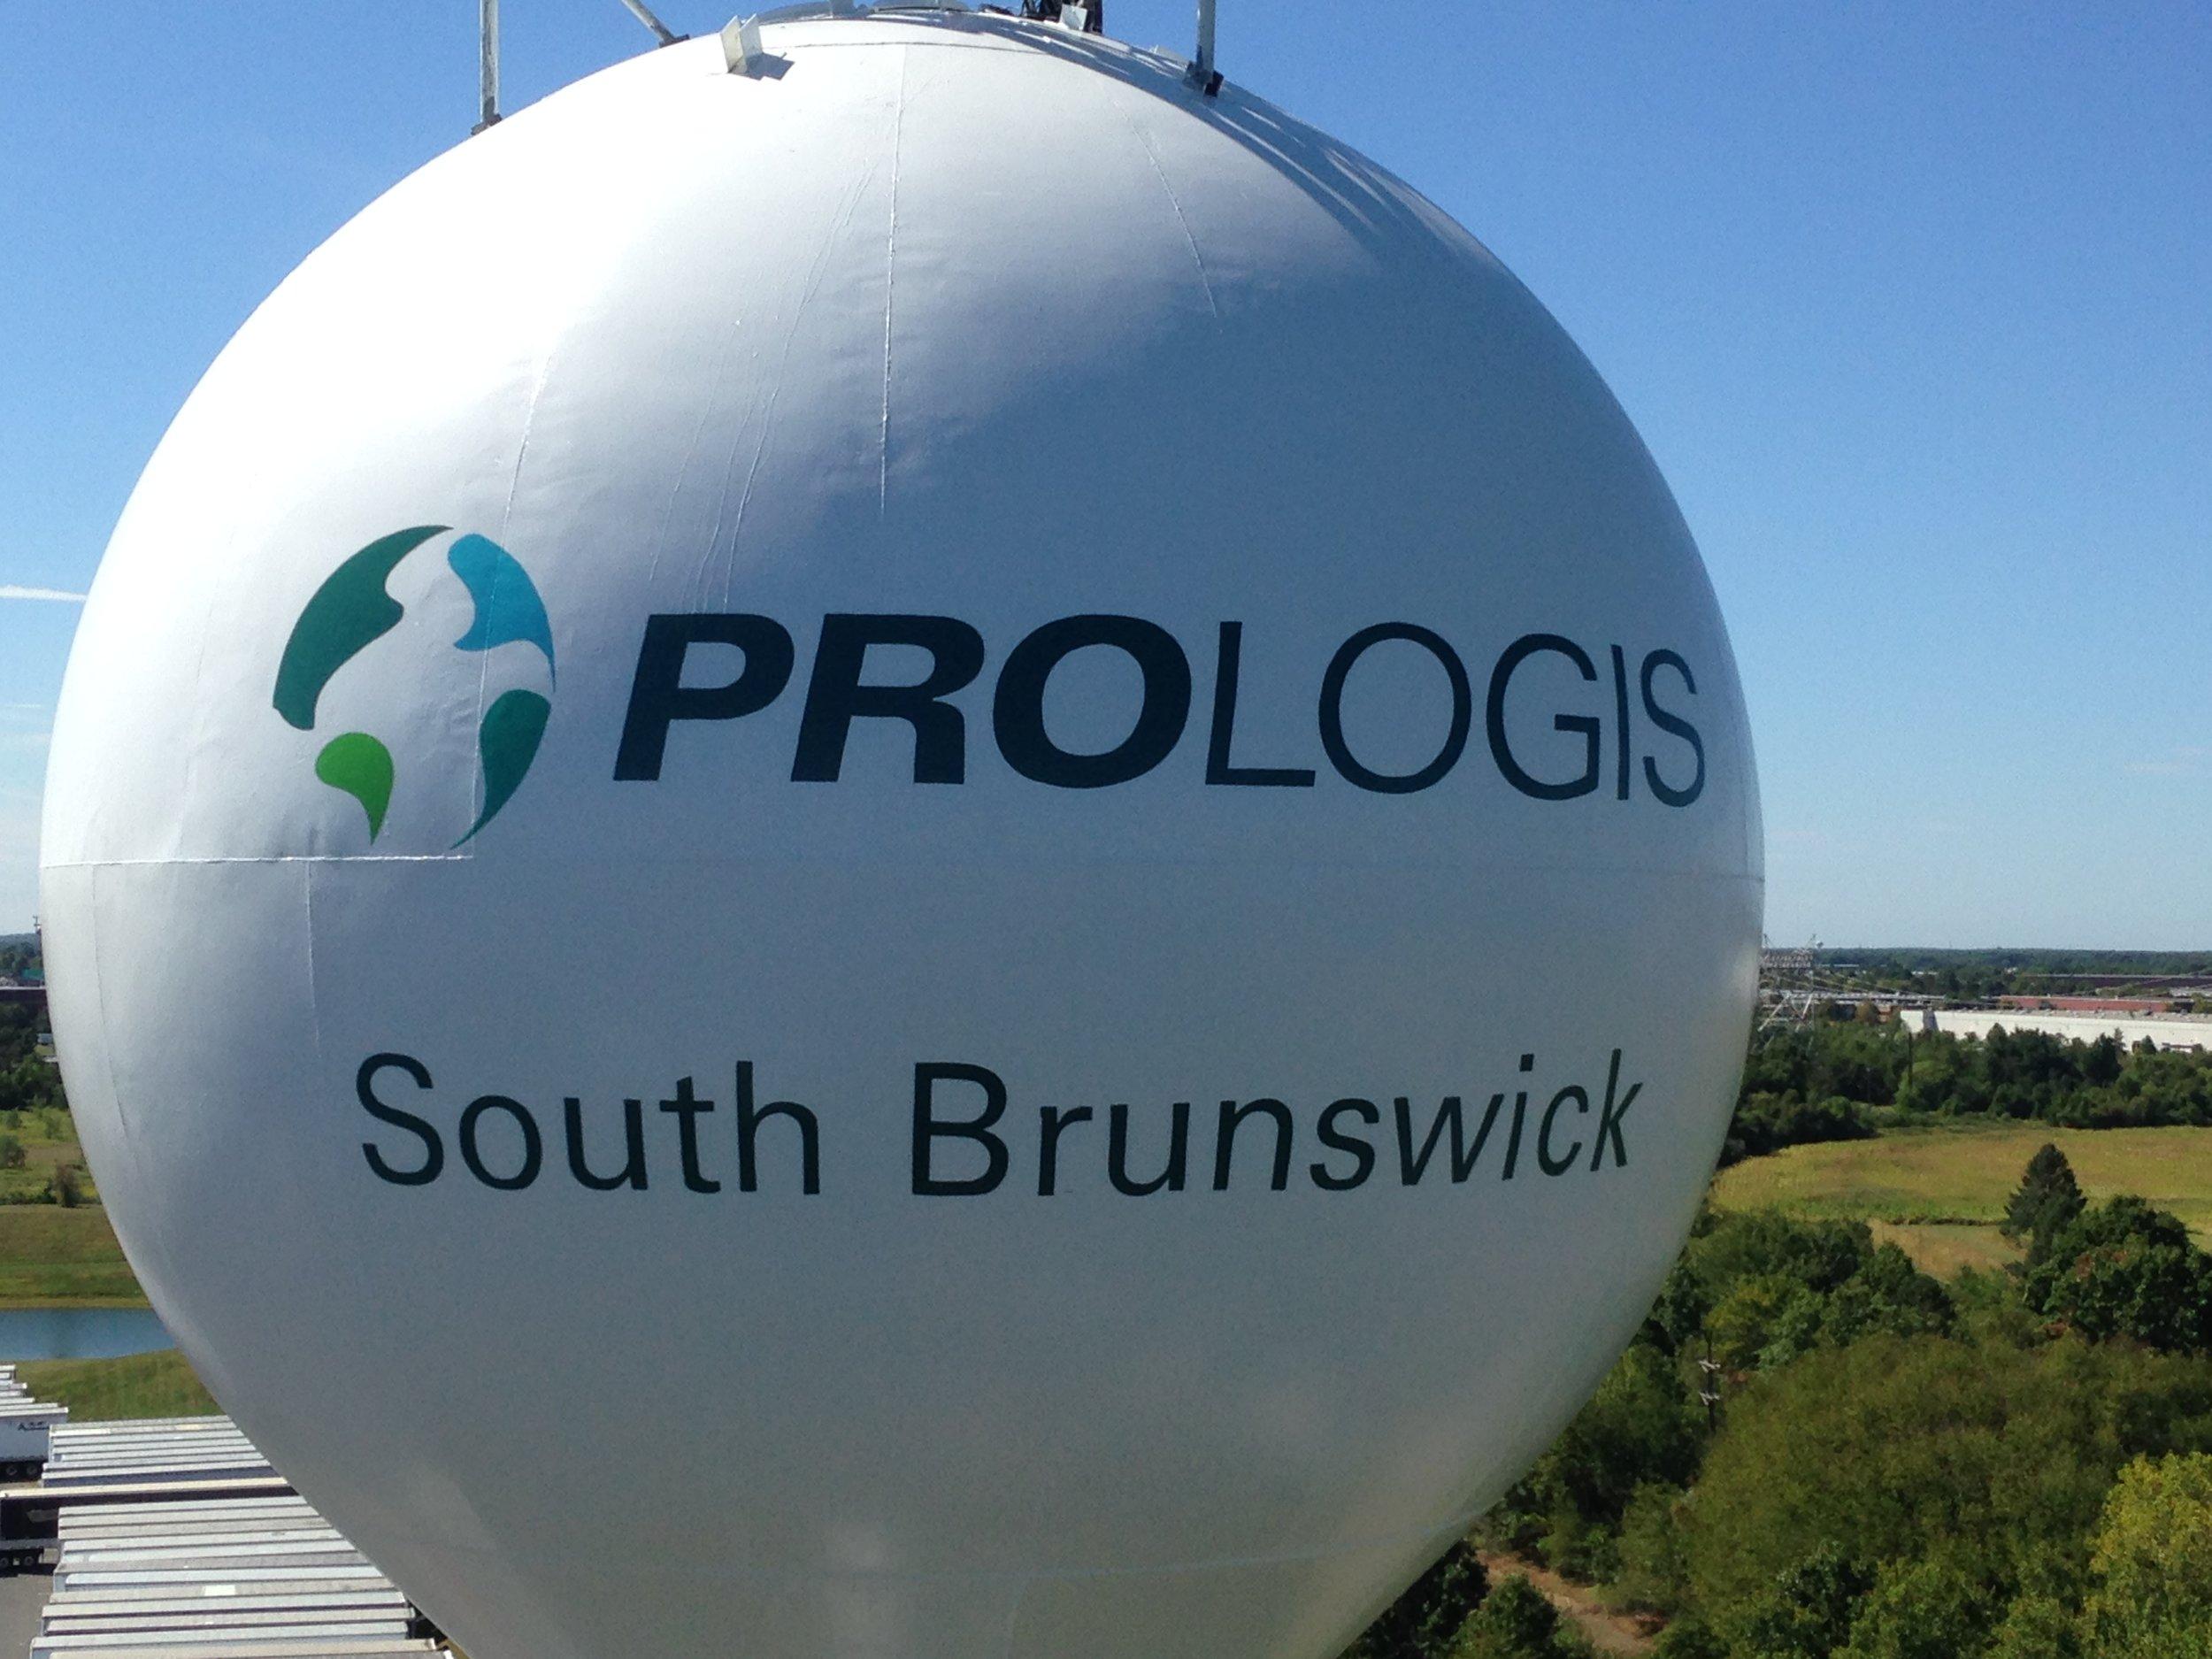 Prologis water tower logo painting, Cranbury NJ